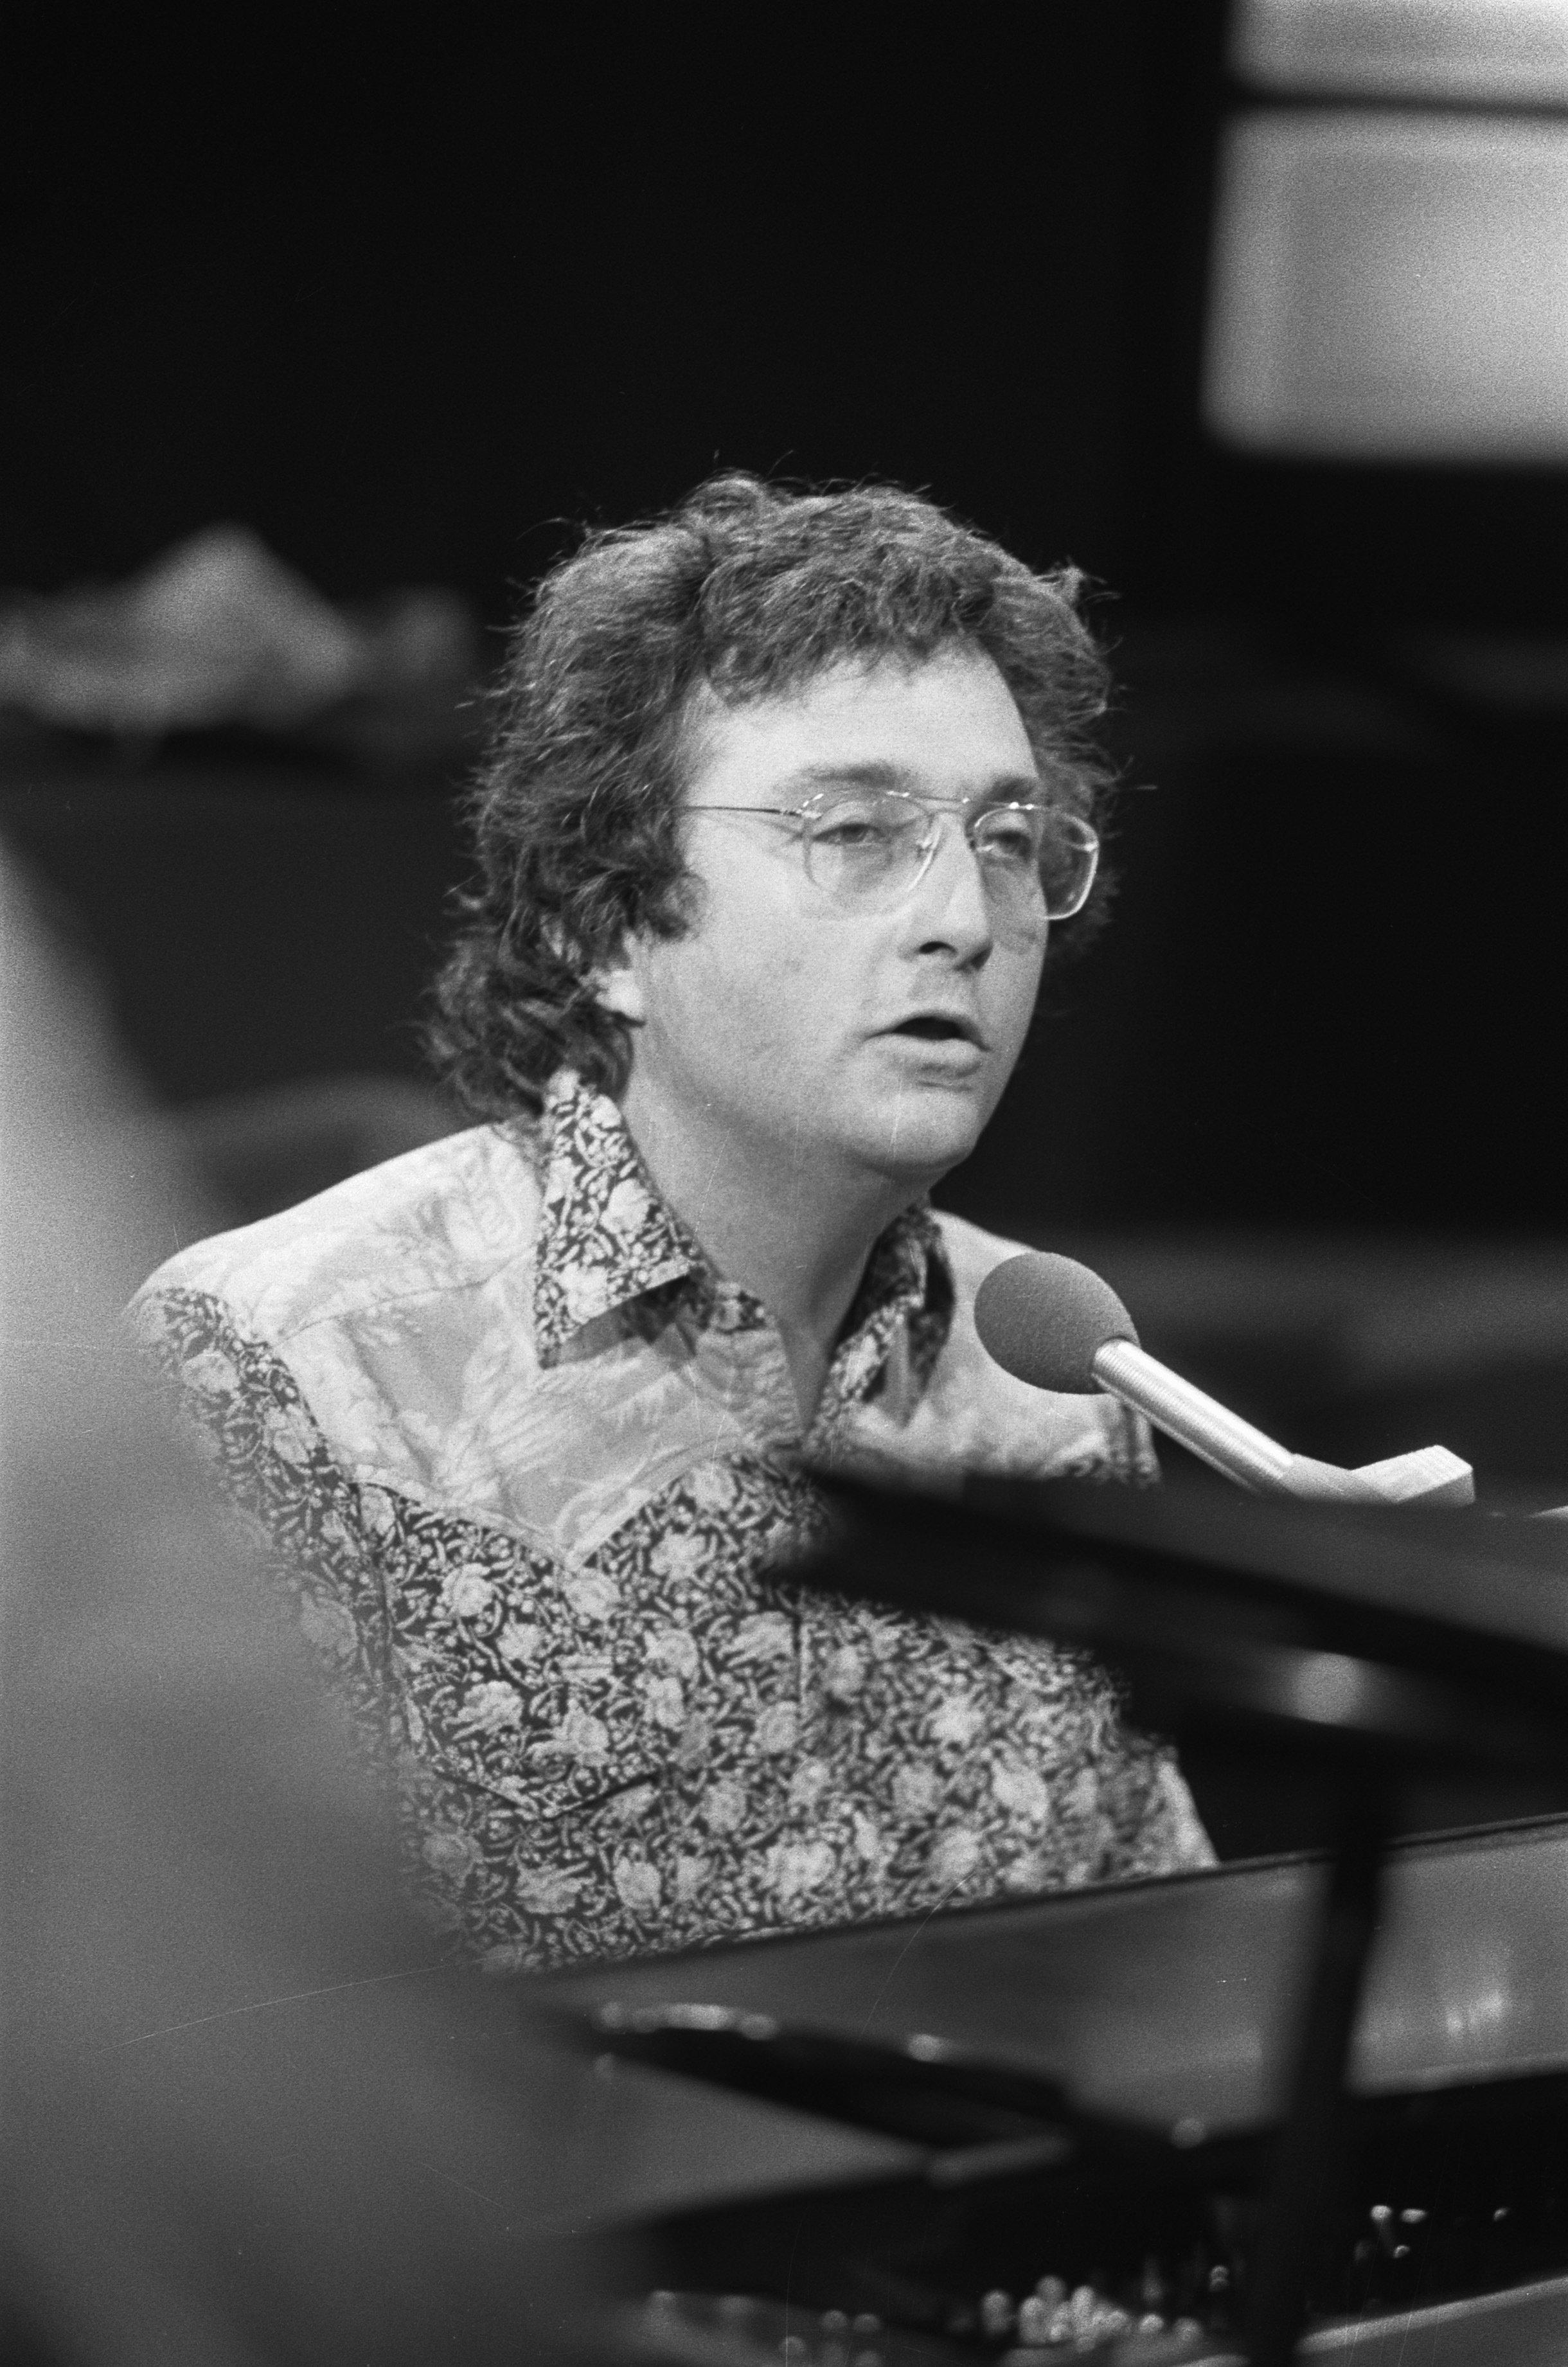 Newman in 1975